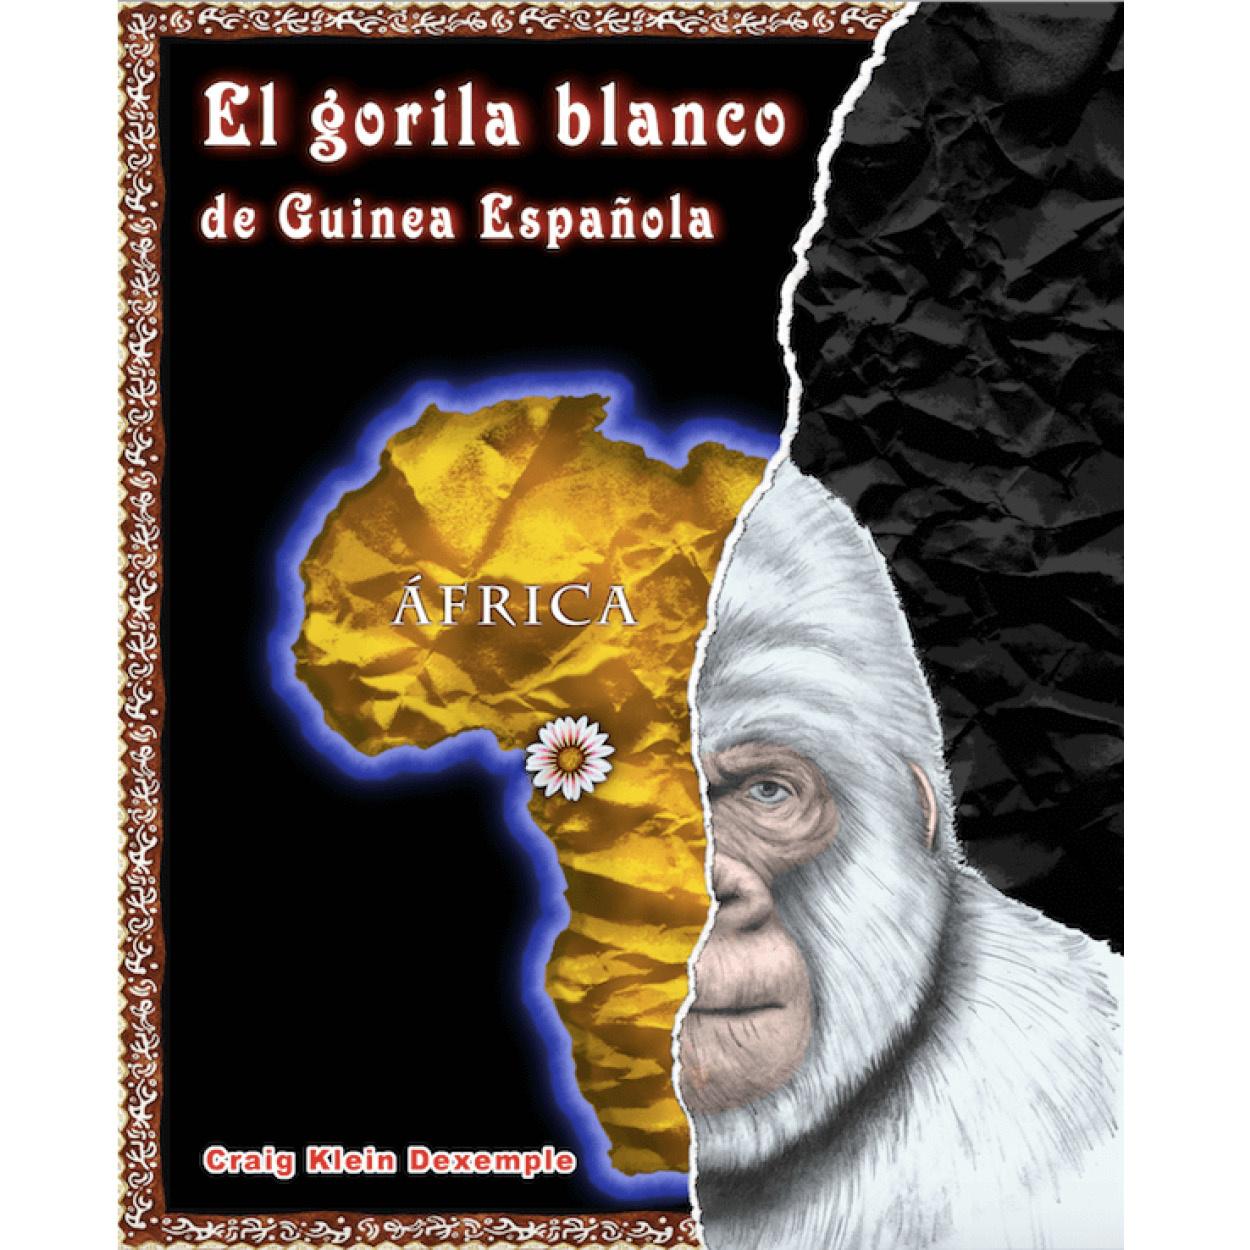 El gorila blanco de Guinea Española